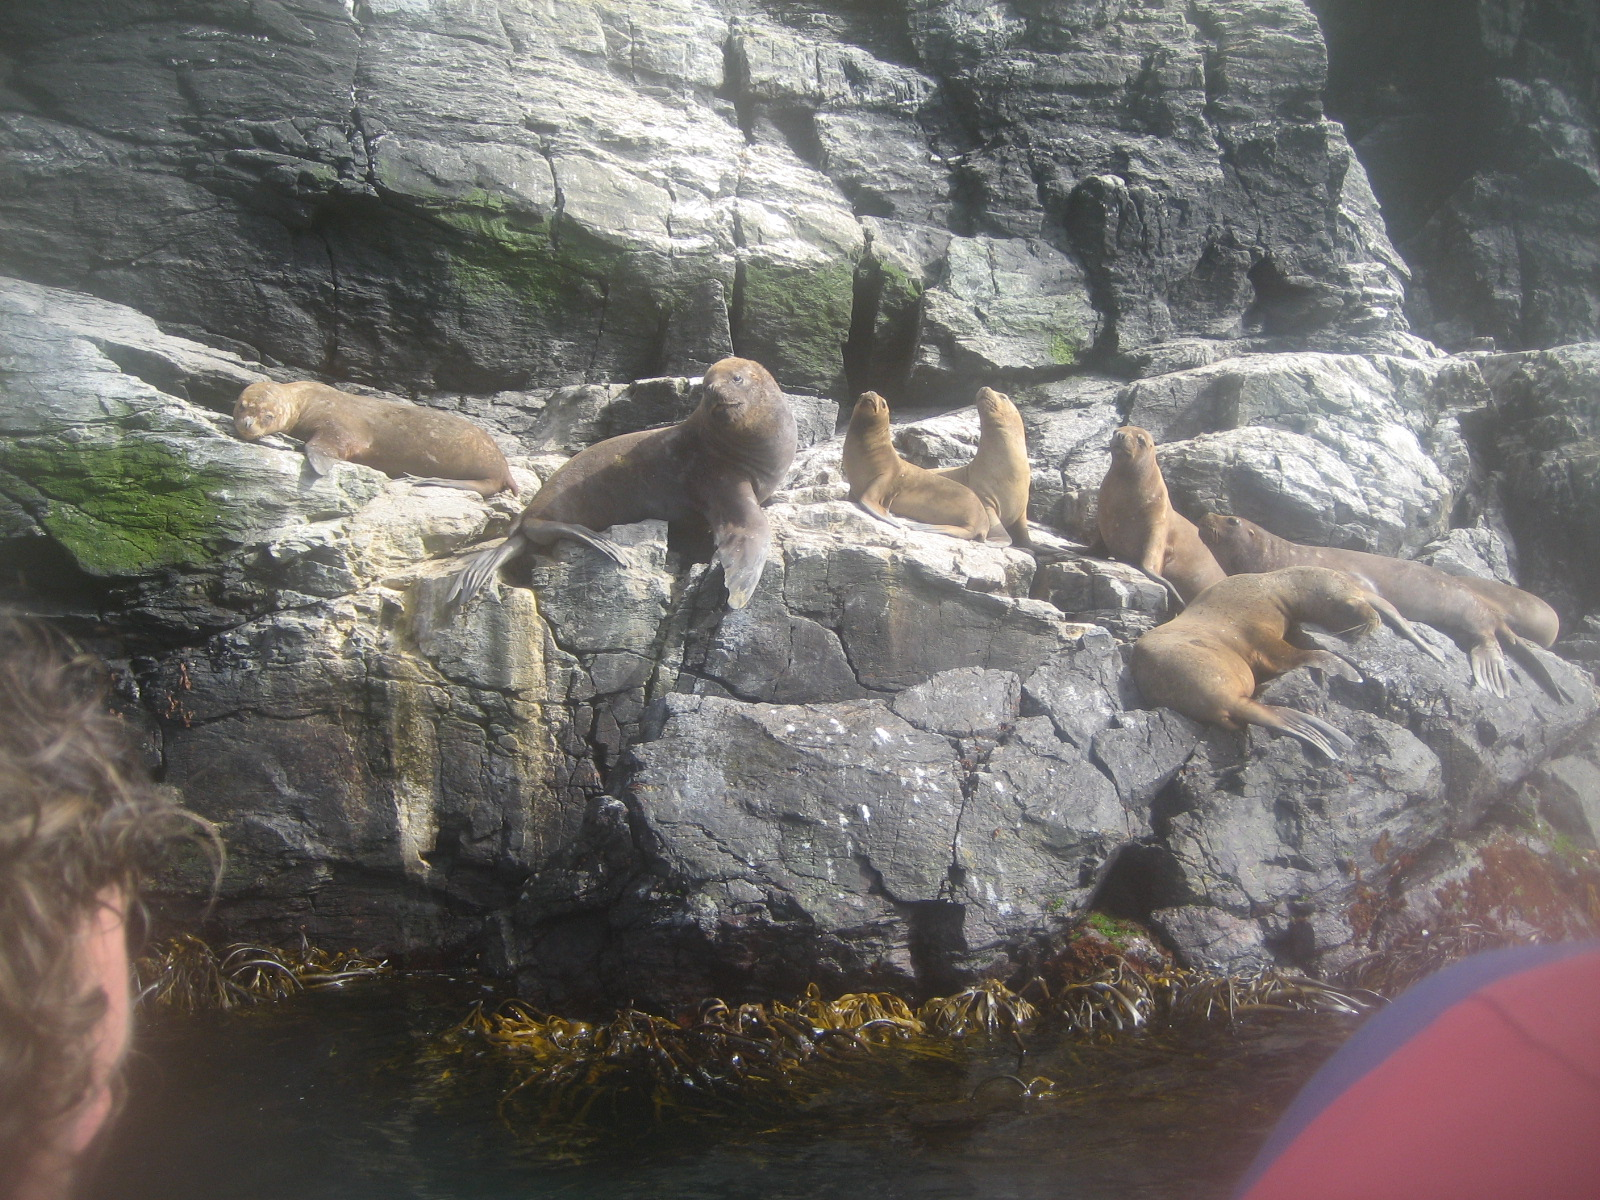 Isla Damas: Reserva Nacional del Pinguino Humboldt